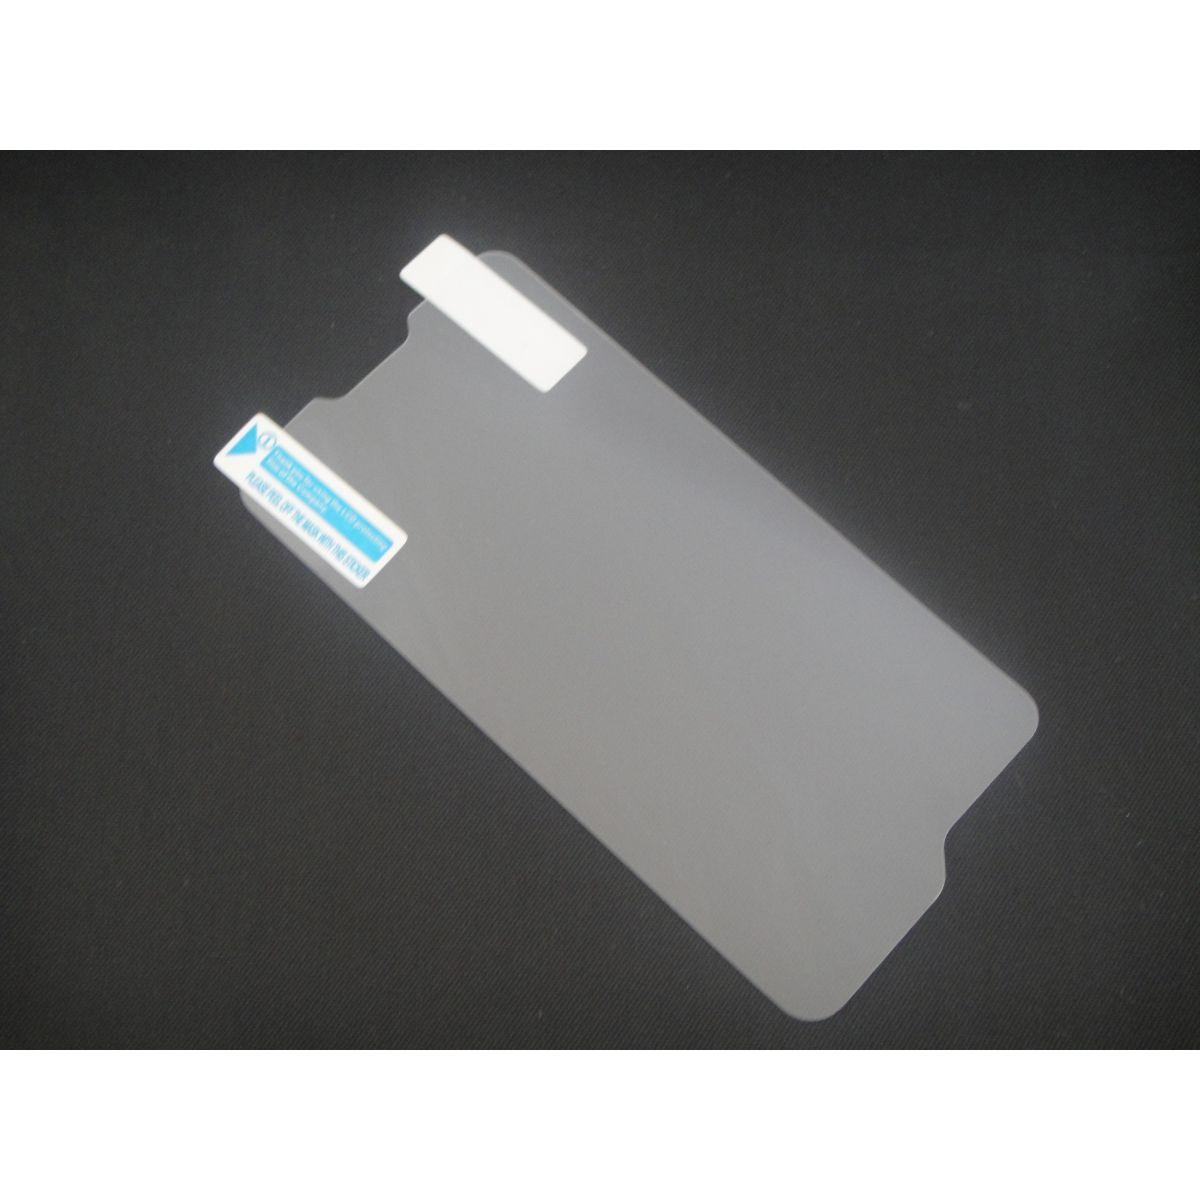 Pelicula Protetora para Motorola Atrix Tv Xt682 Xt687 Transparente